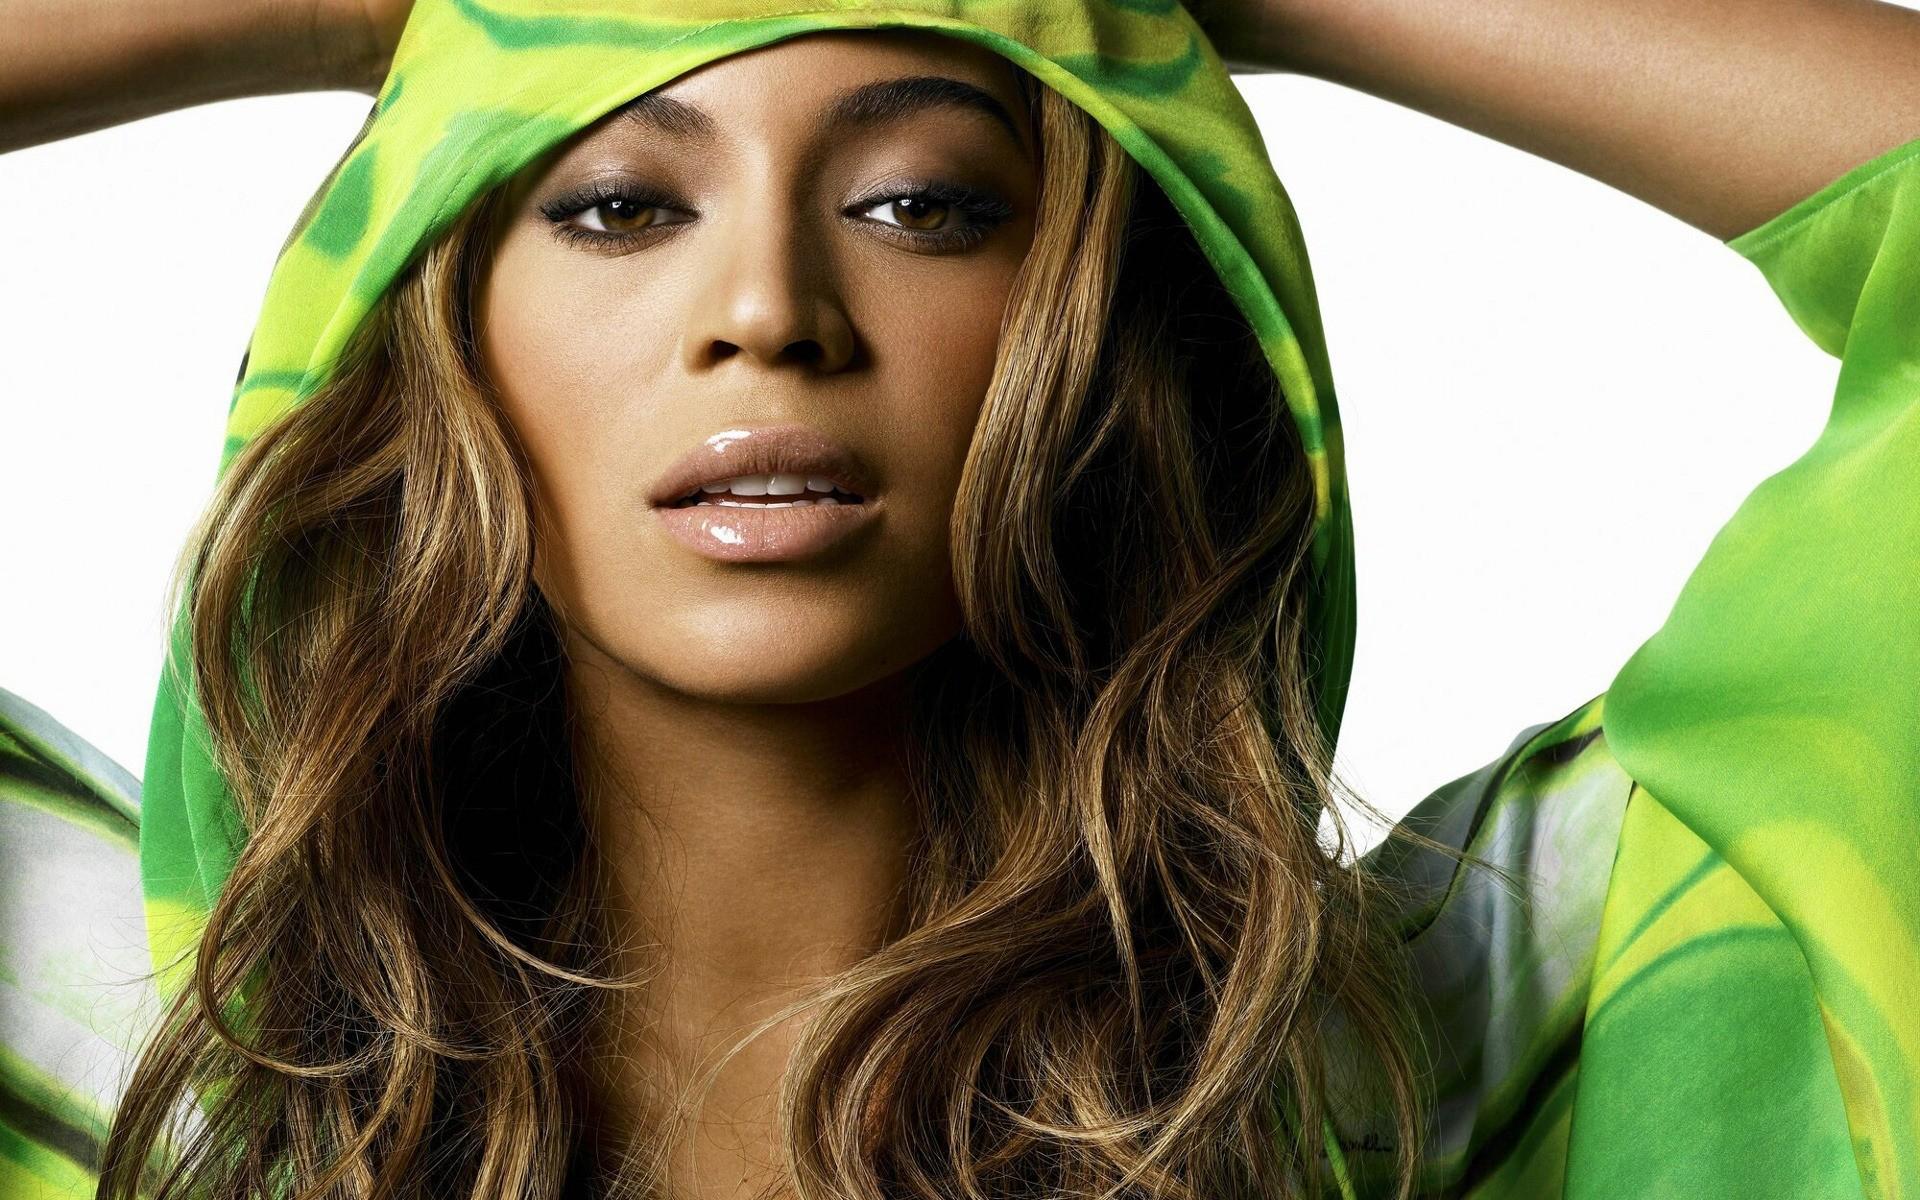 Beyonce Giselle Knowles Wallpaper Beyonce Female celebrities